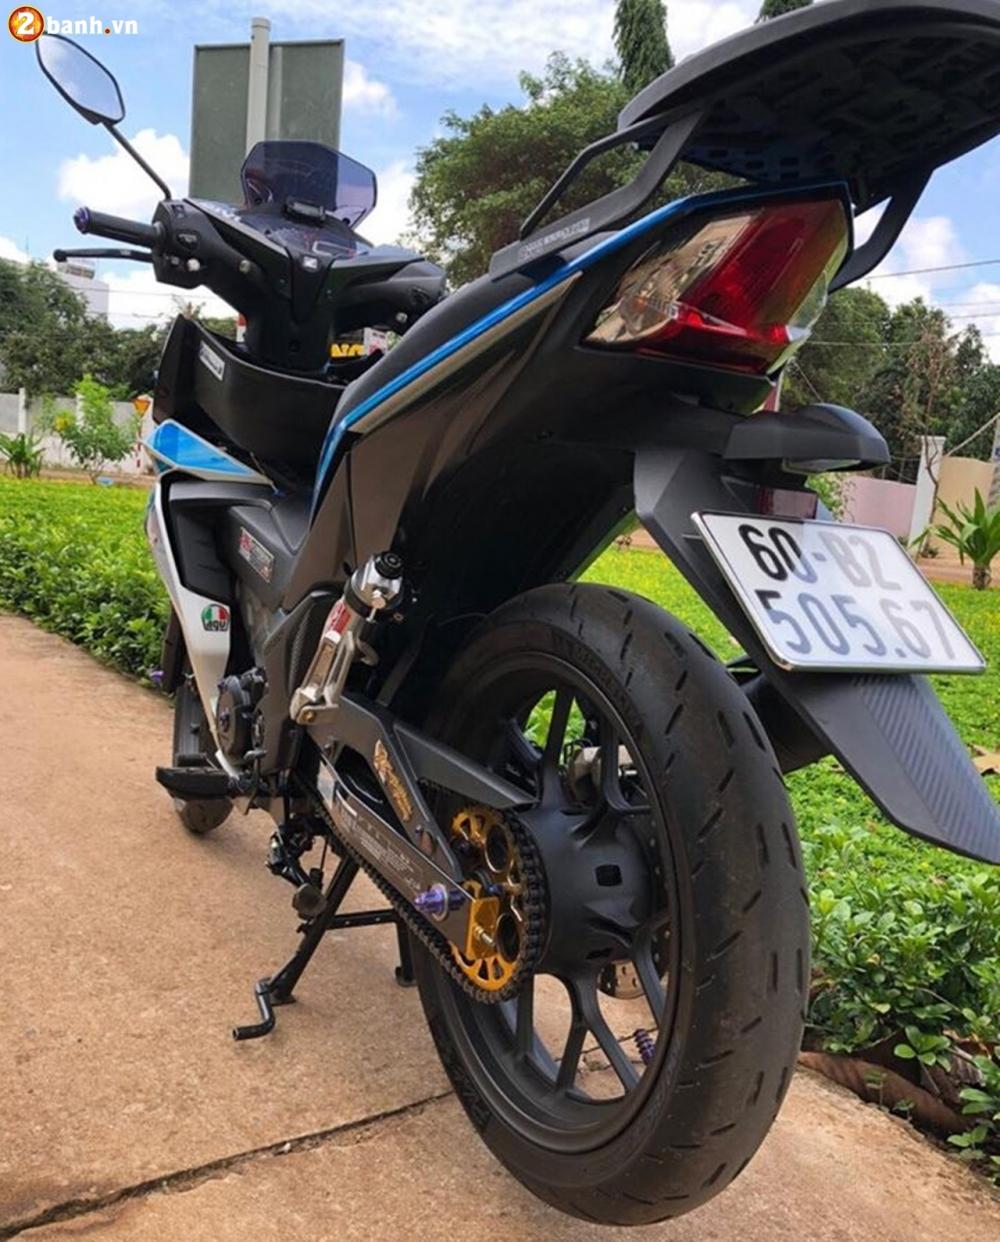 Winner 150 do phong cach Style zin gay me nguoi xem cua biker Long Khanh - 11